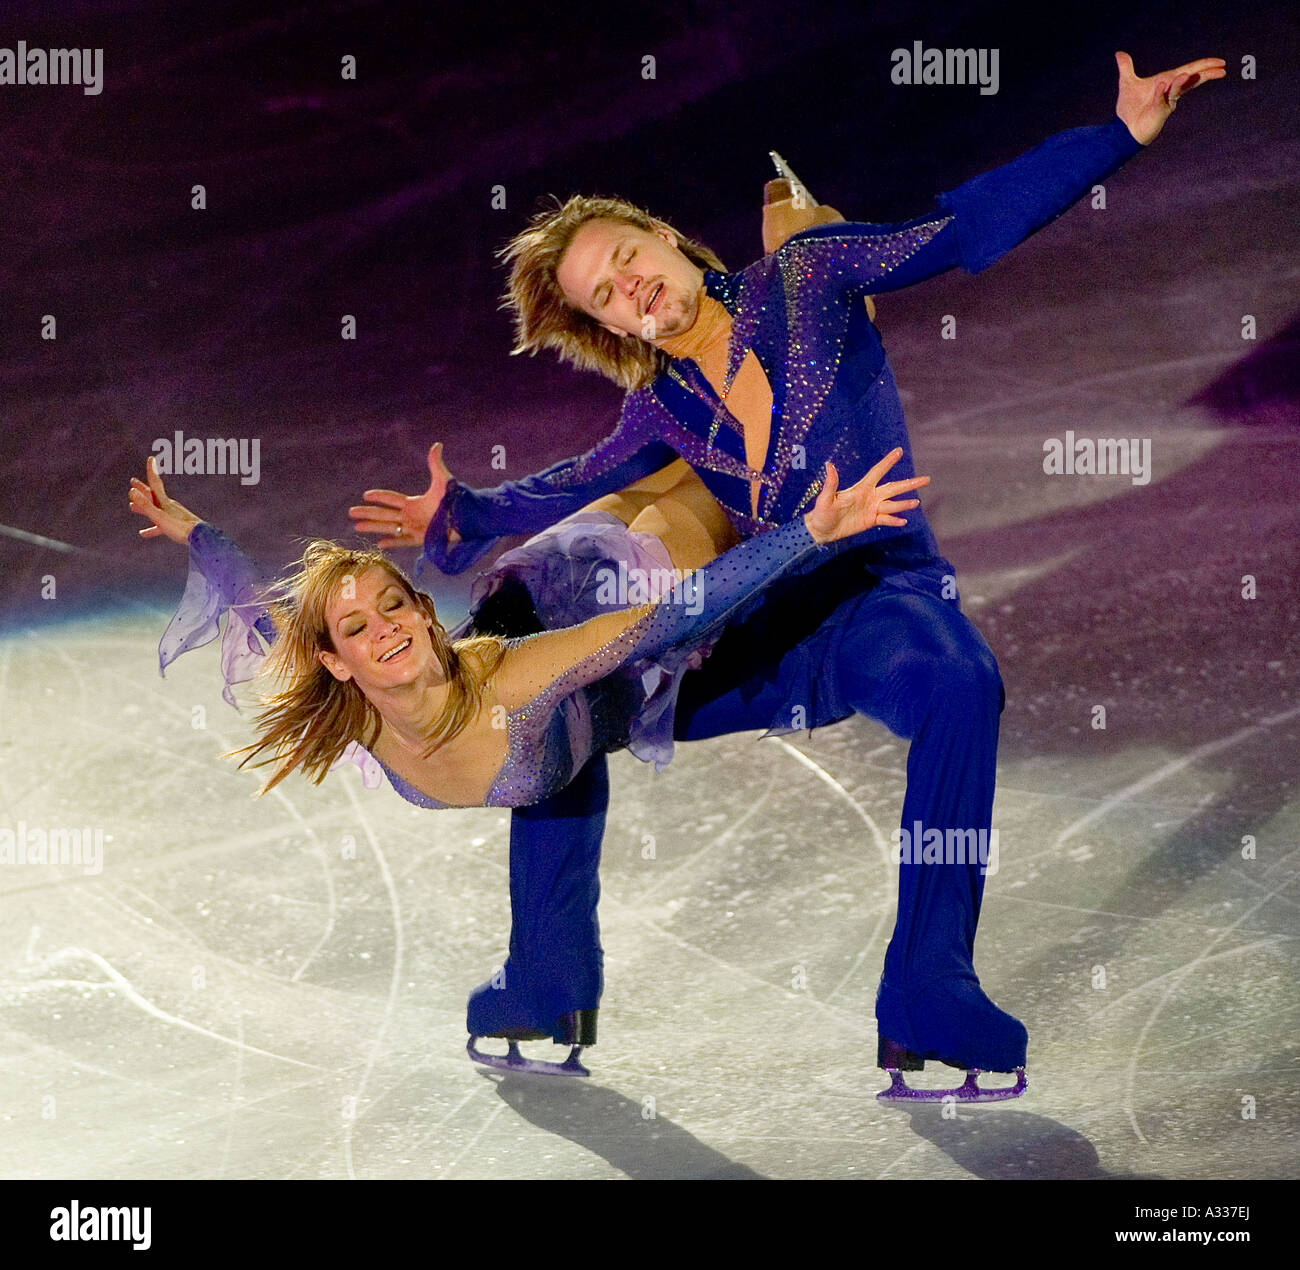 Albena DENKOVA Maxom STAVISKIJ Russland World champions in ice dancing Int Schaulaufen Oberstdorf 30 12 2006 - Stock Image